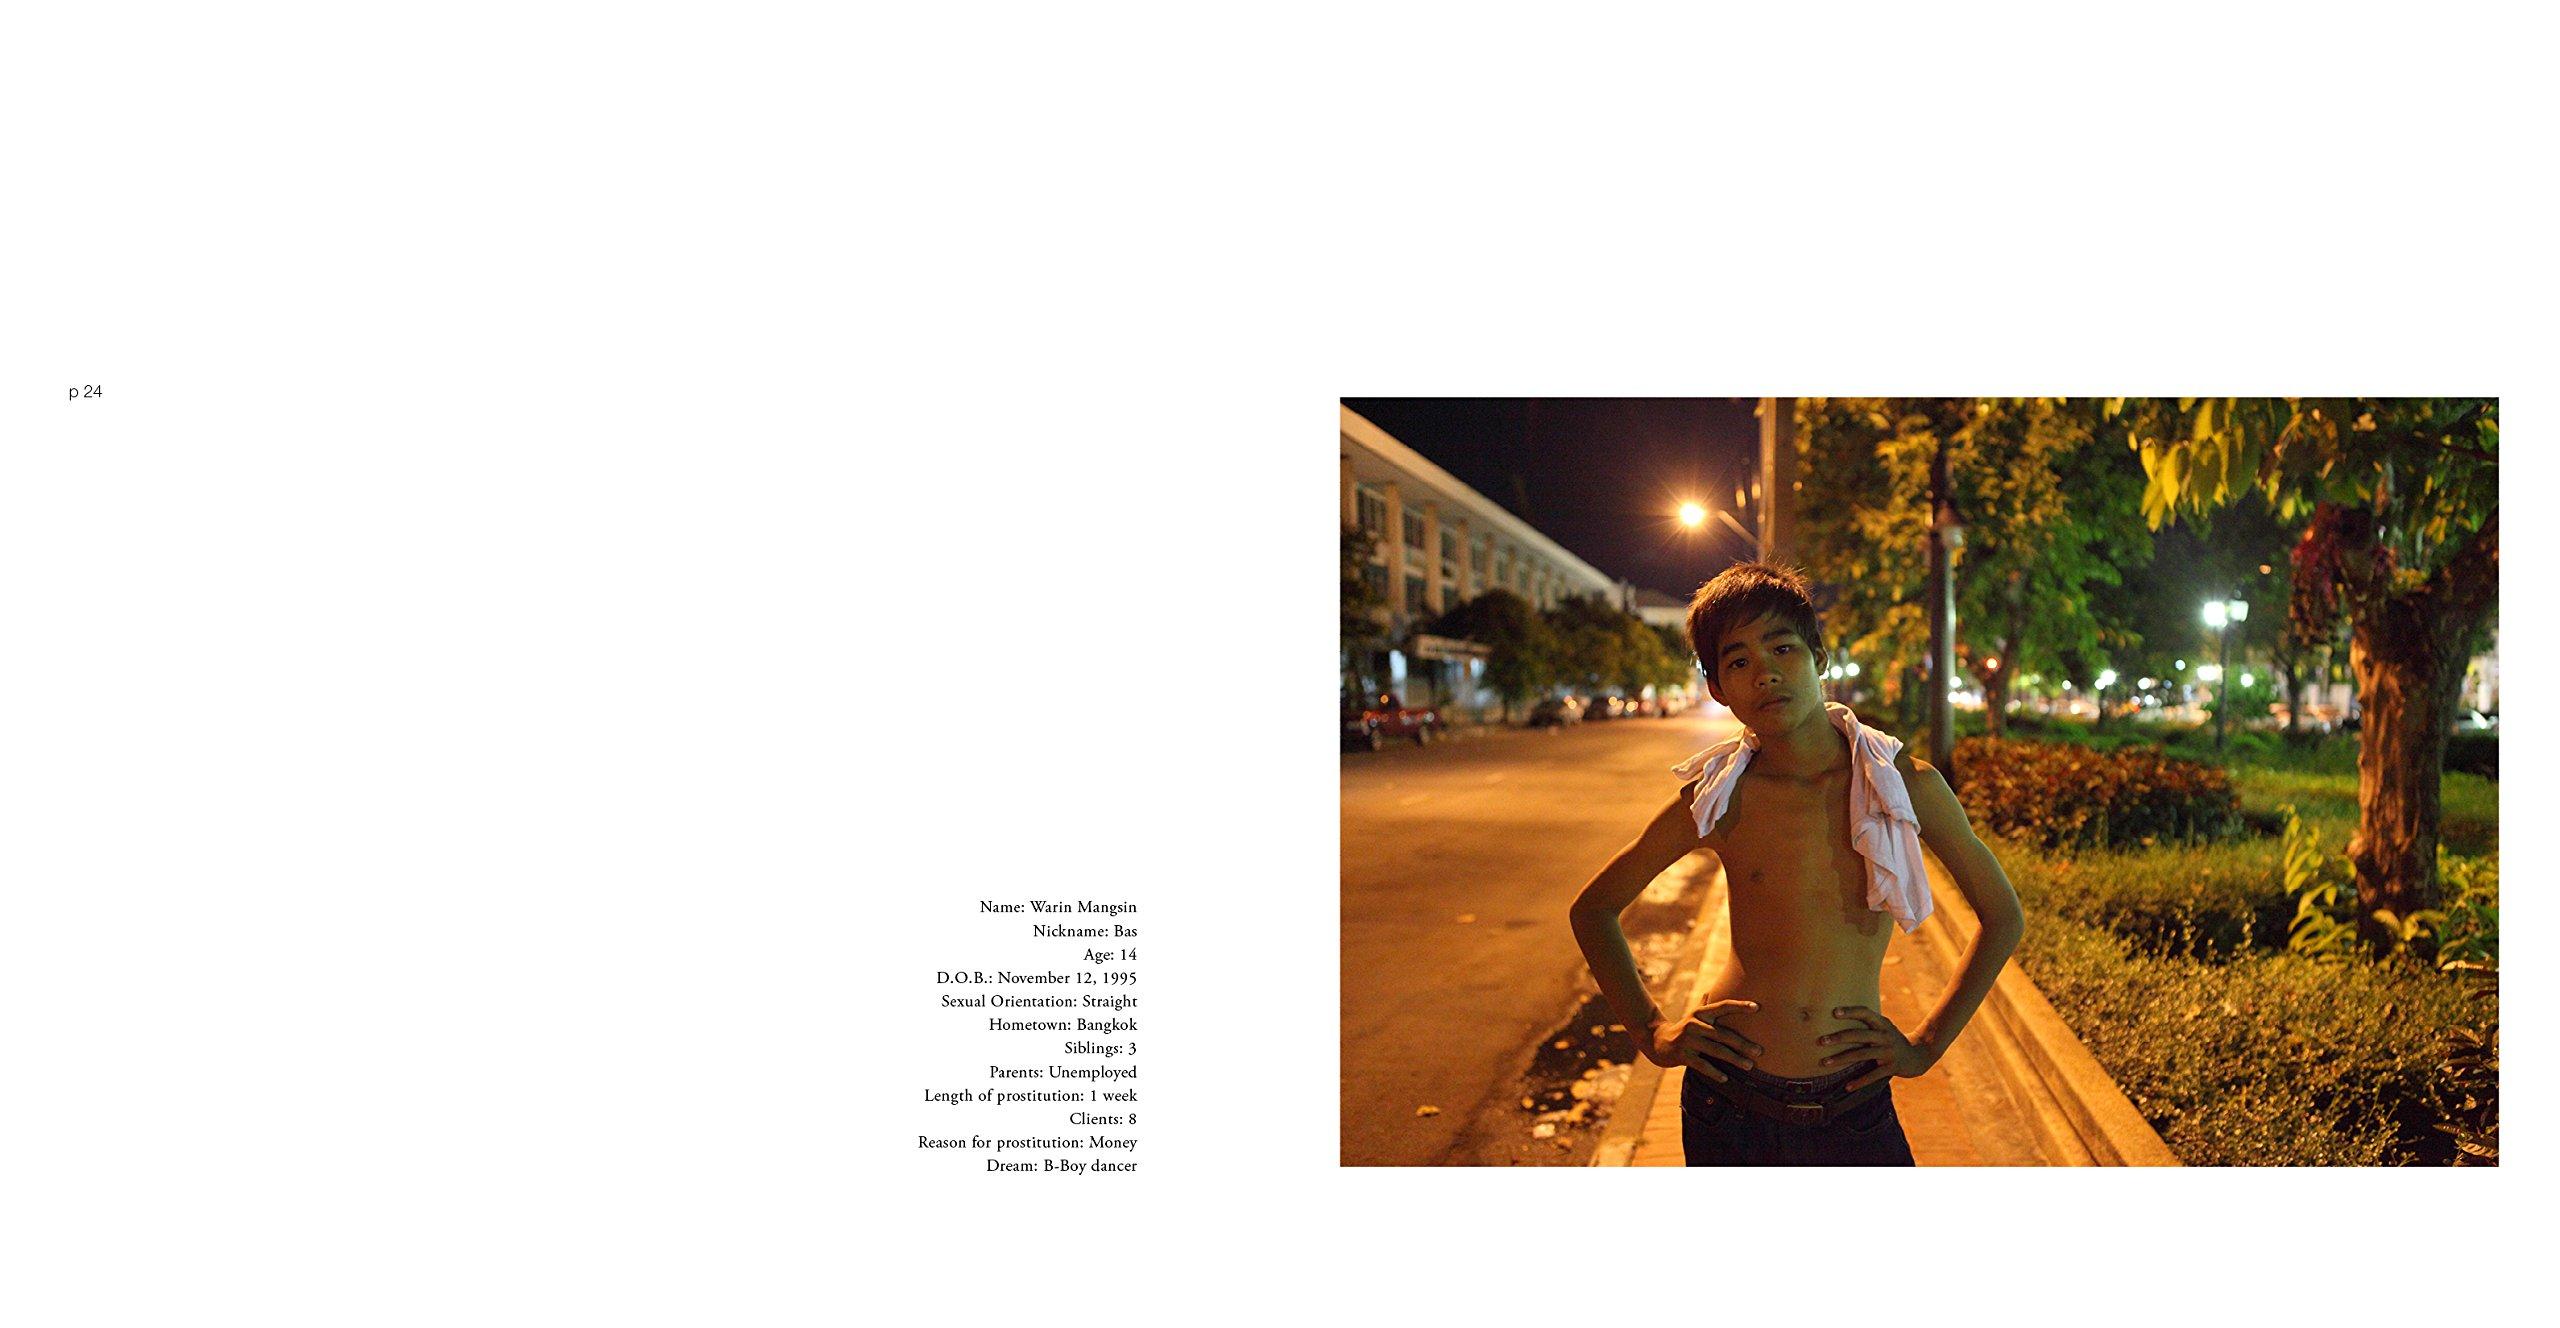 underage nude chil art fotografie